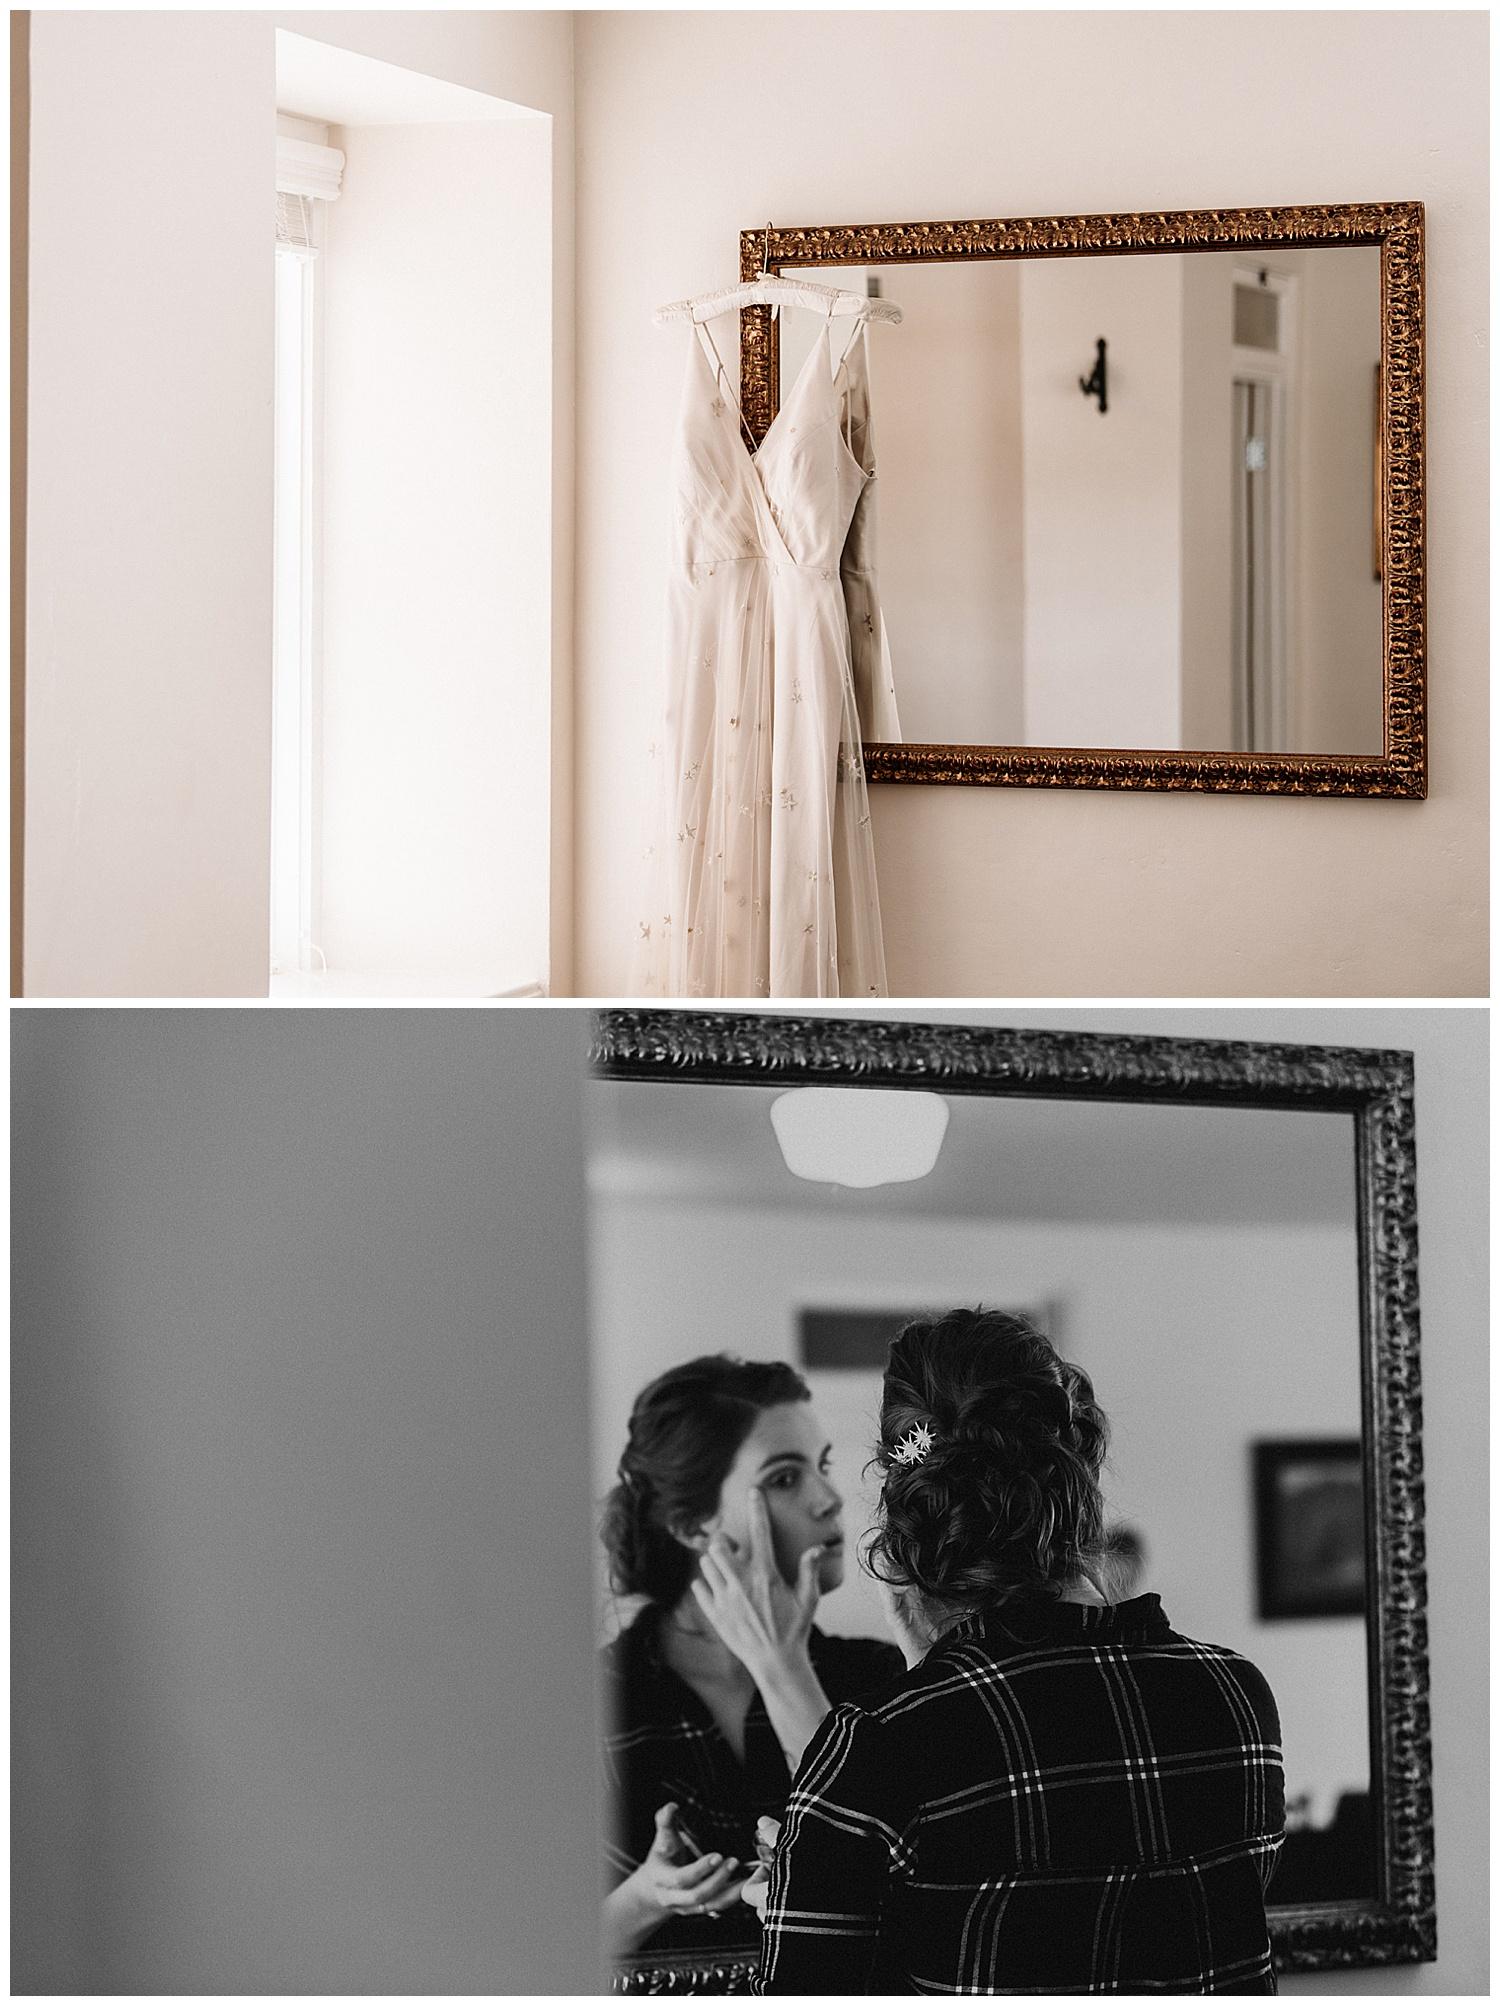 SamEricaStudios - San Diego Wedding Photographer - Galaxy Themed Rainy Day Wedding Parq West San Diego_0023.jpg